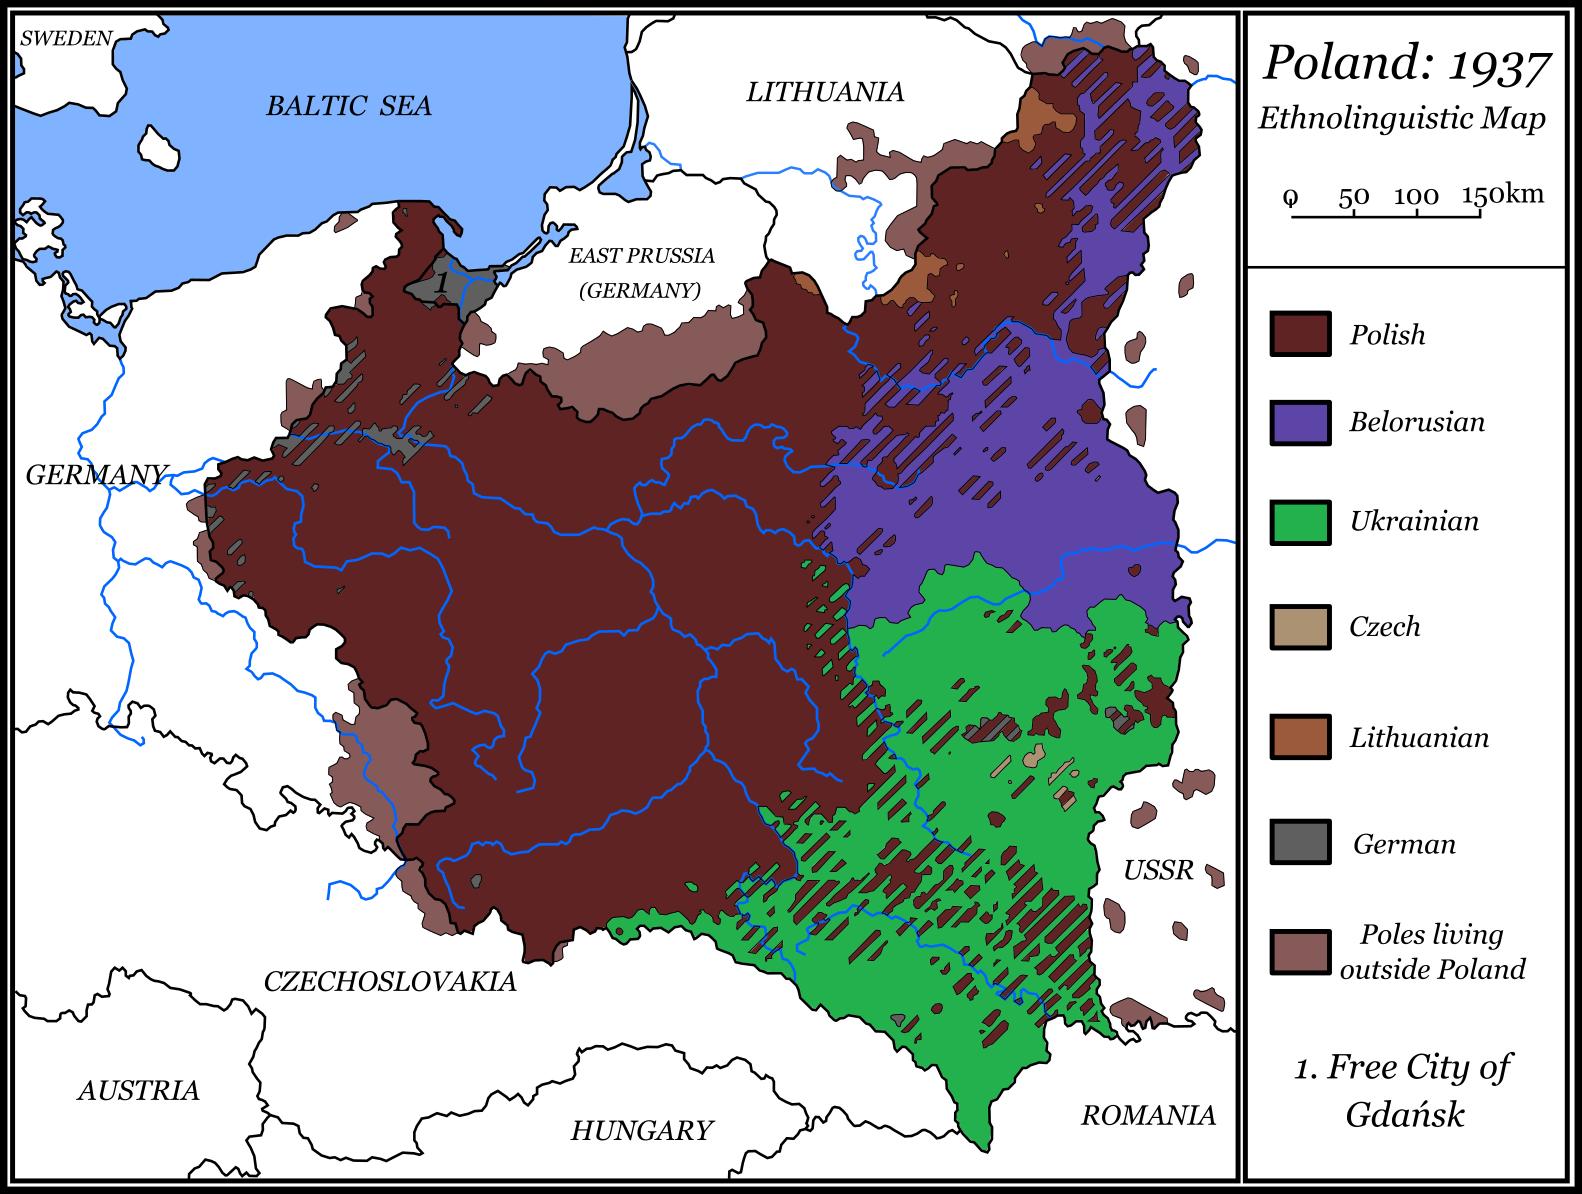 Polen Karte.Ethnolinguistic Map Of Poland 1937 Polen Illustrierte Karten